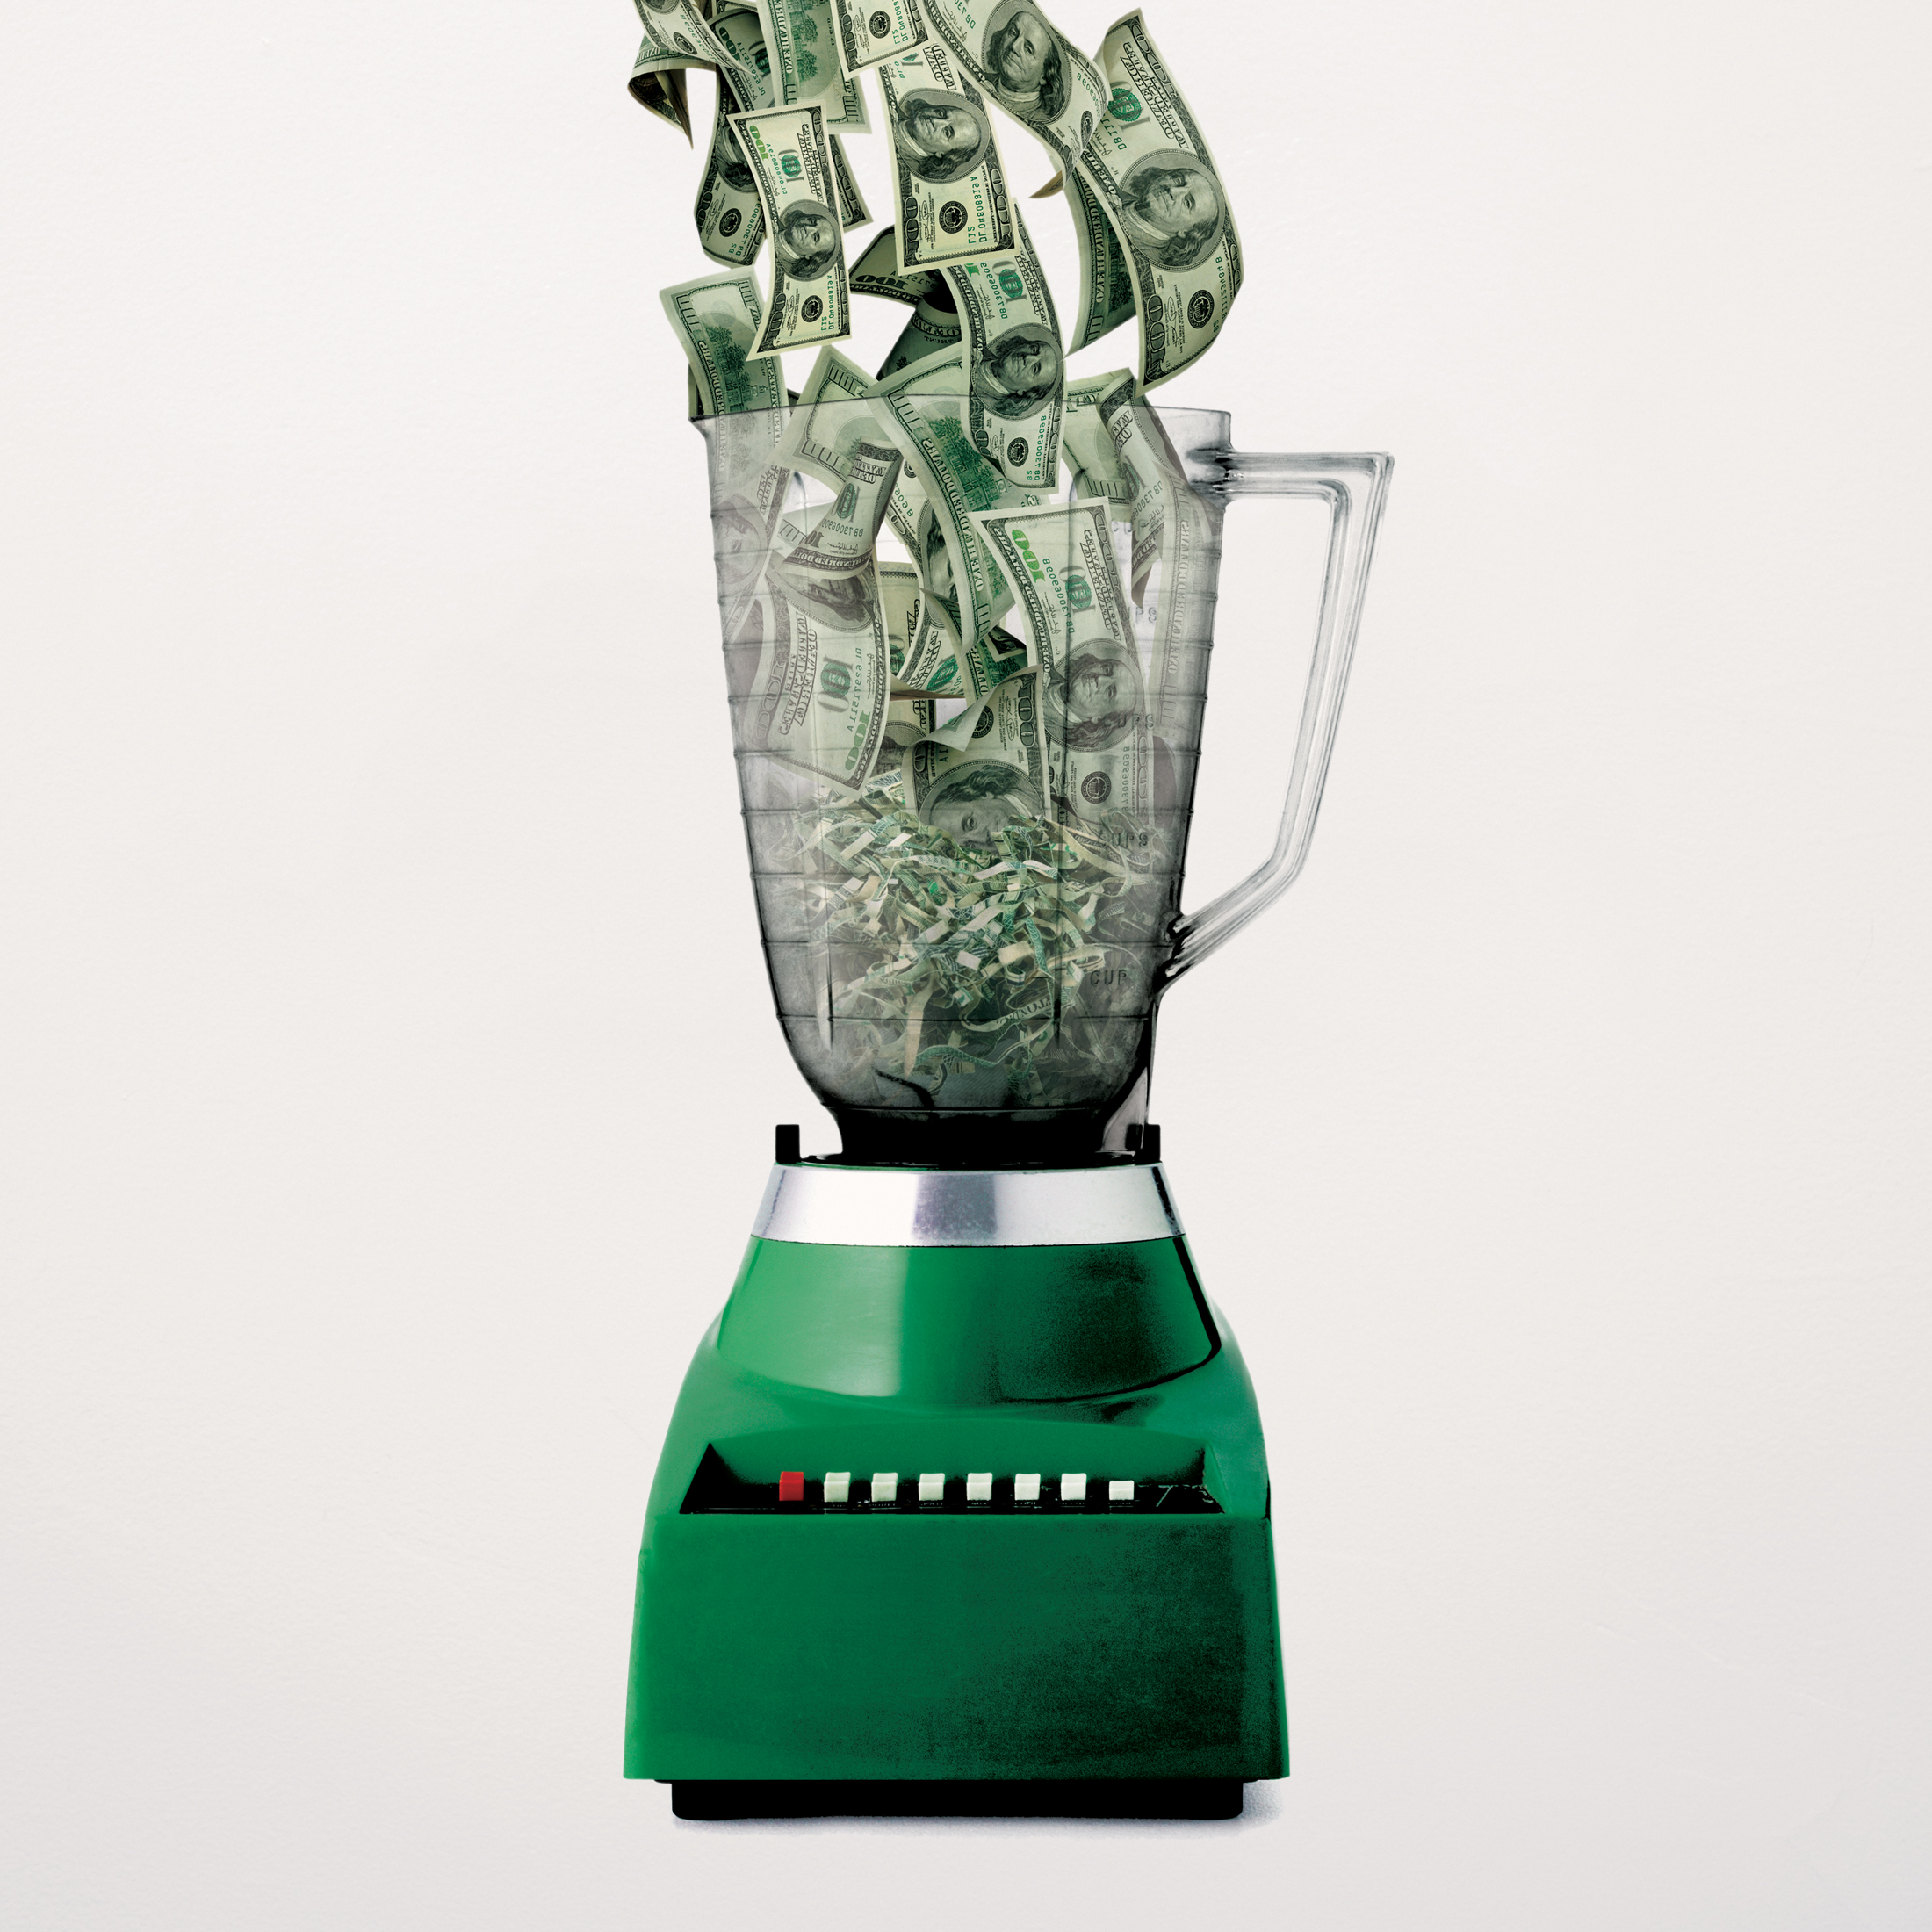 Betting on zero documentary nfl week 16 betting lines